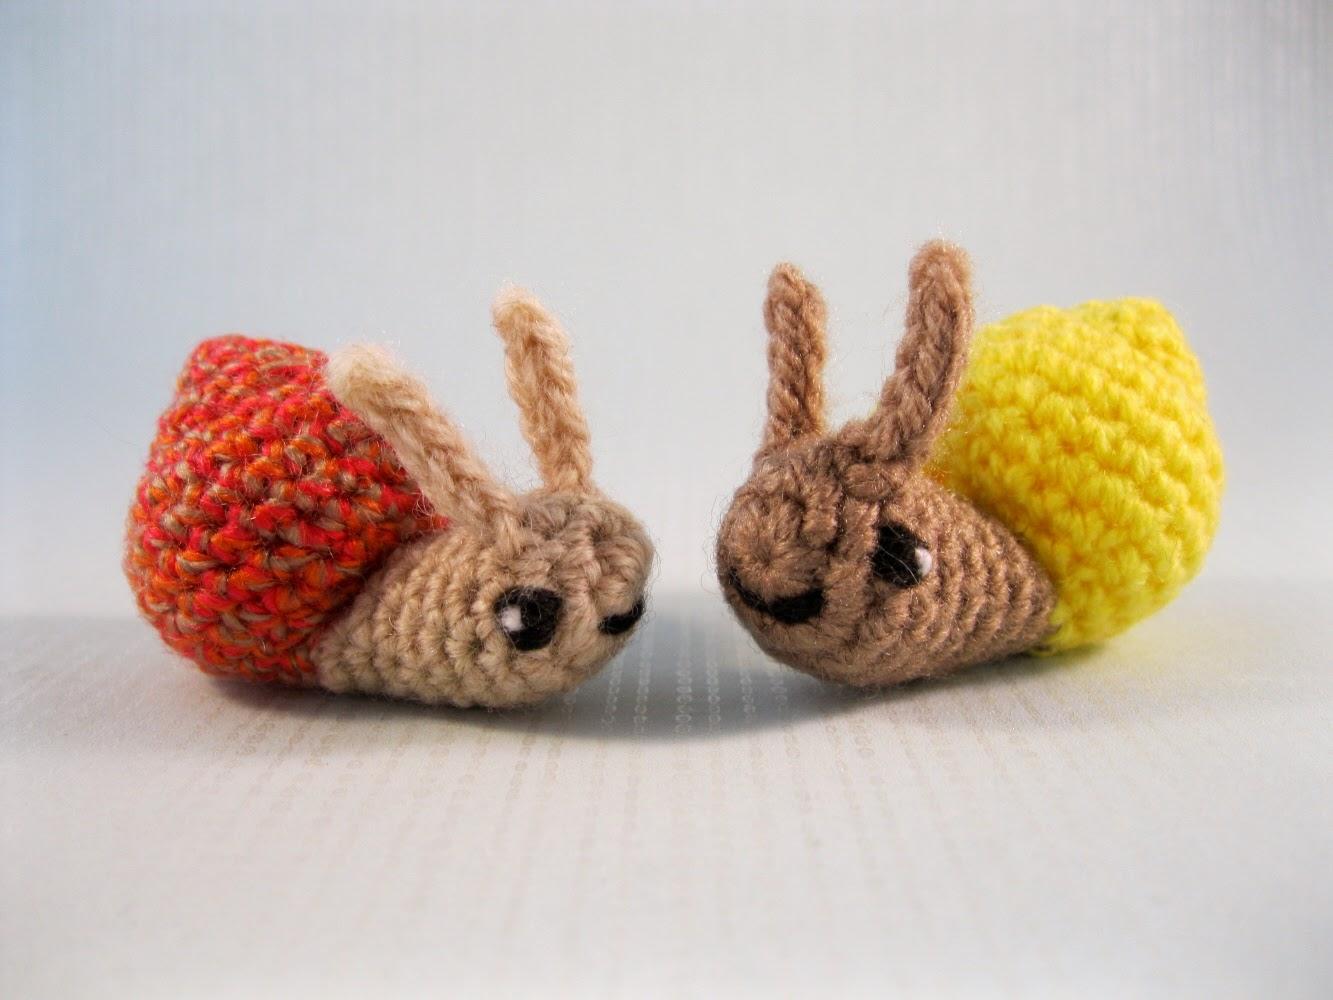 Amigurumi Beetle : LucyRavenscar - Crochet Creatures: Mini Pets - Snails ...